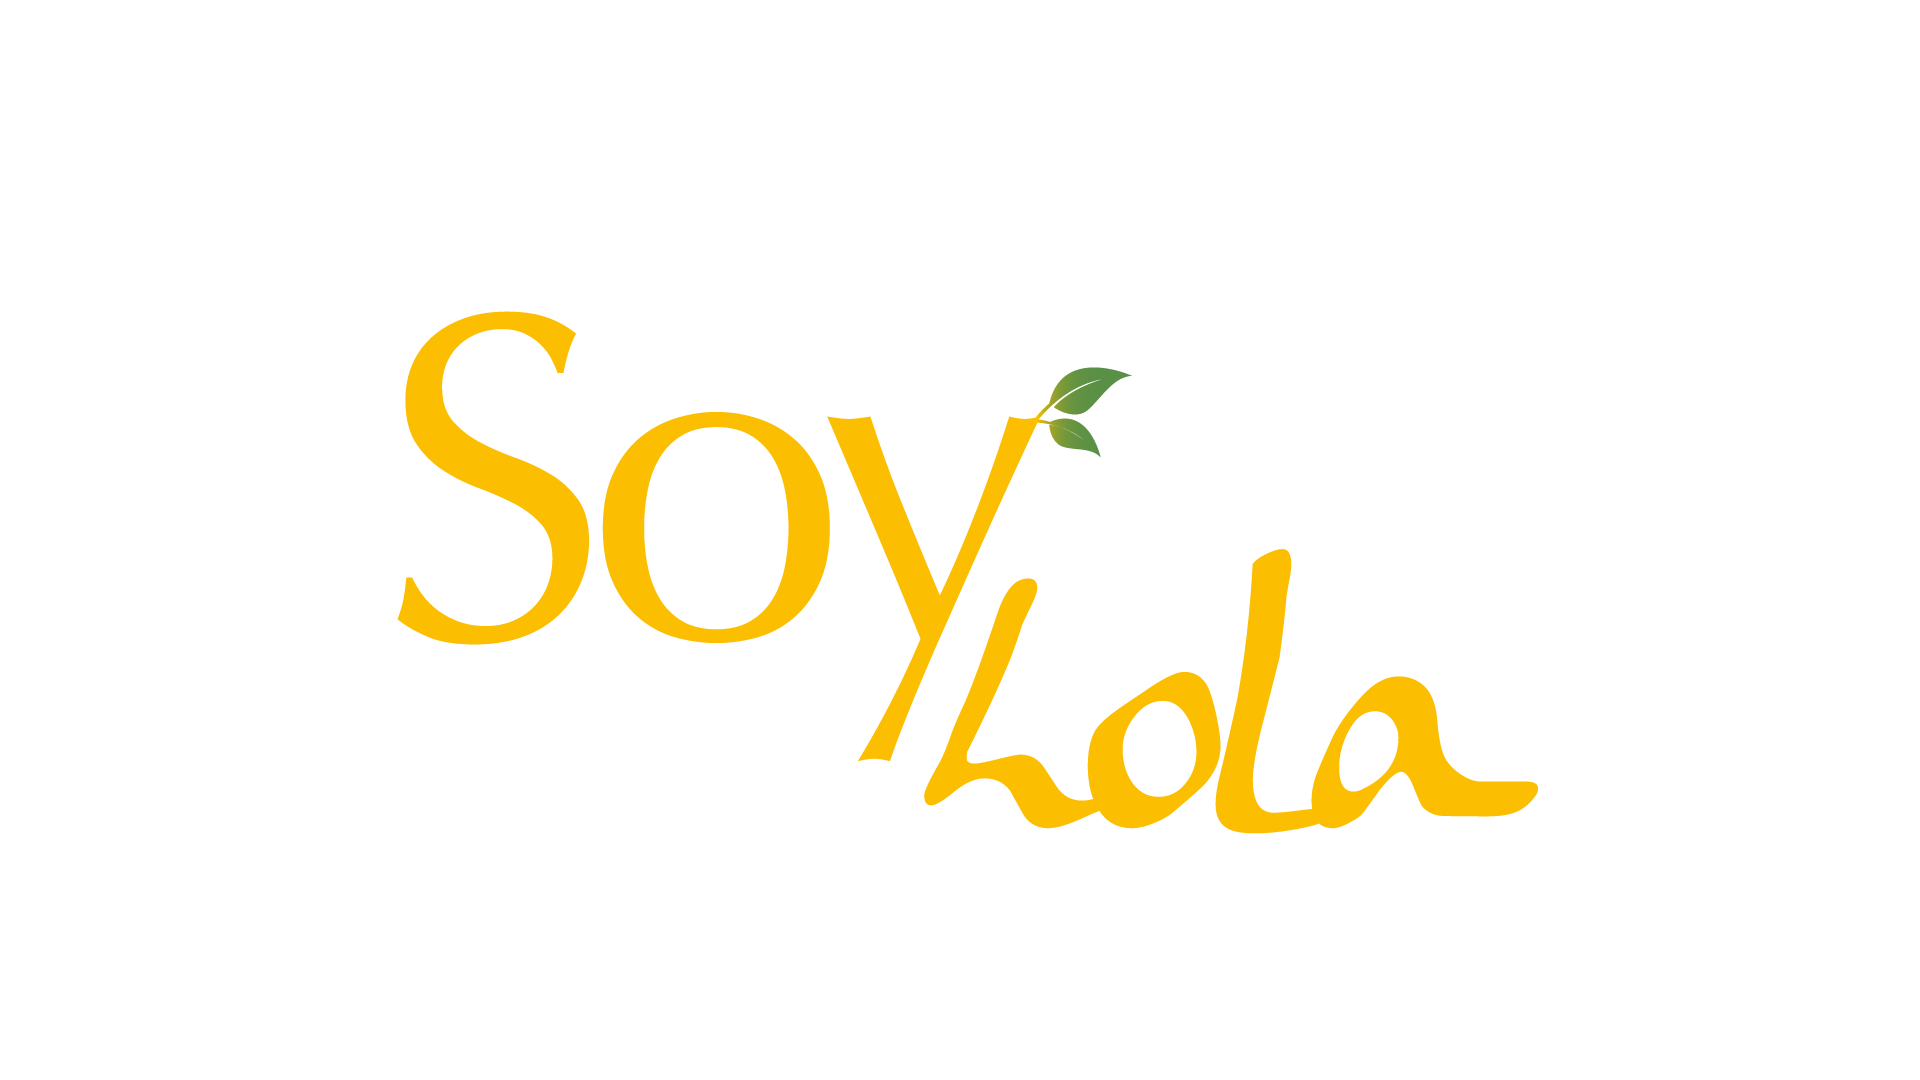 Soy-lola-logo-screen-1920-1080